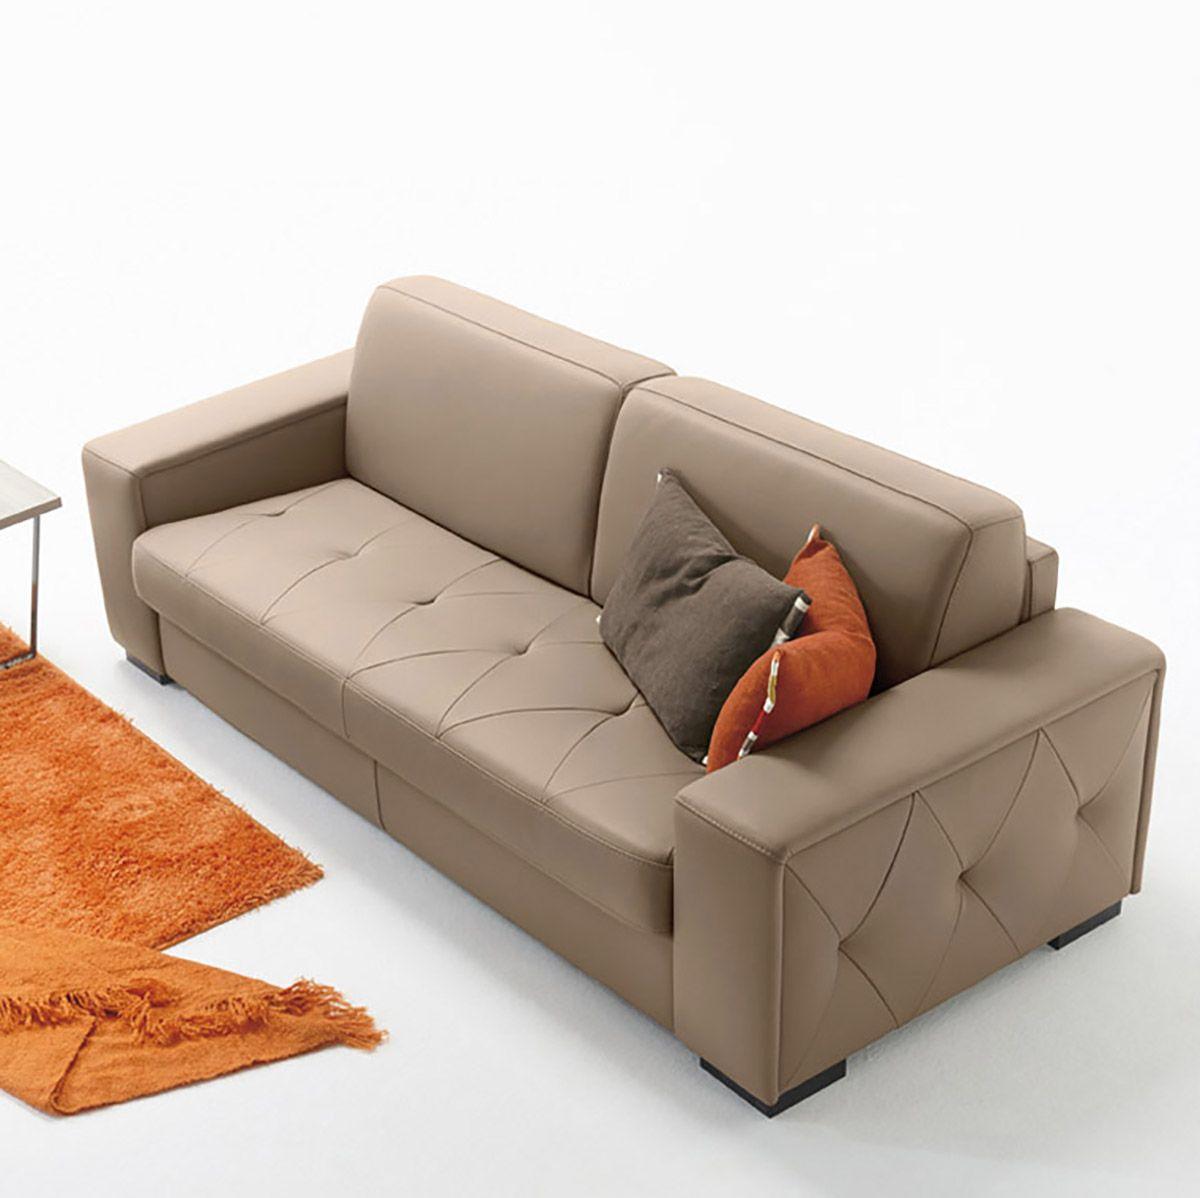 Positano Design Depot Furniture Furniture Miami Showroom Classic Sofa Living Room Sofa Set Designs Cushions On Sofa